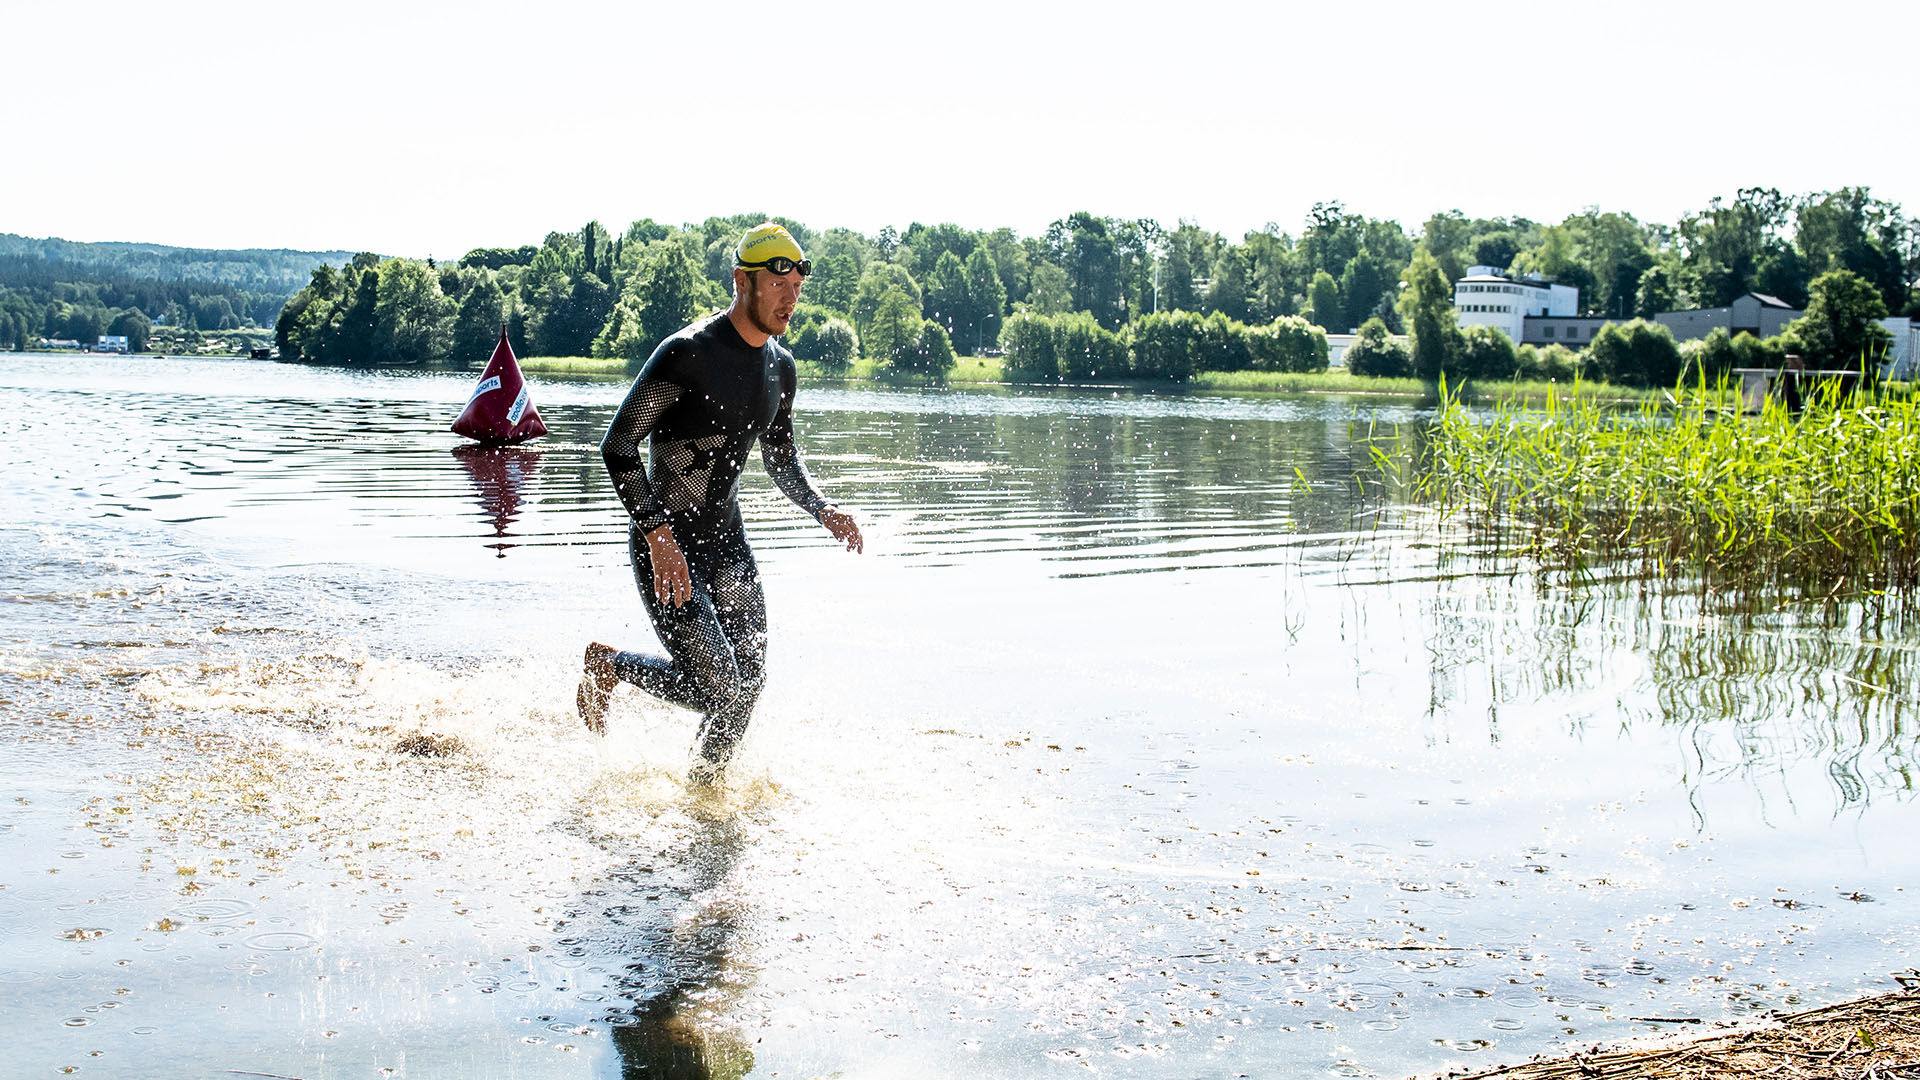 Boras Swimrun Karta.Boras Triathlon En Triathlontavling Over Halv Im Och Sprintdistans